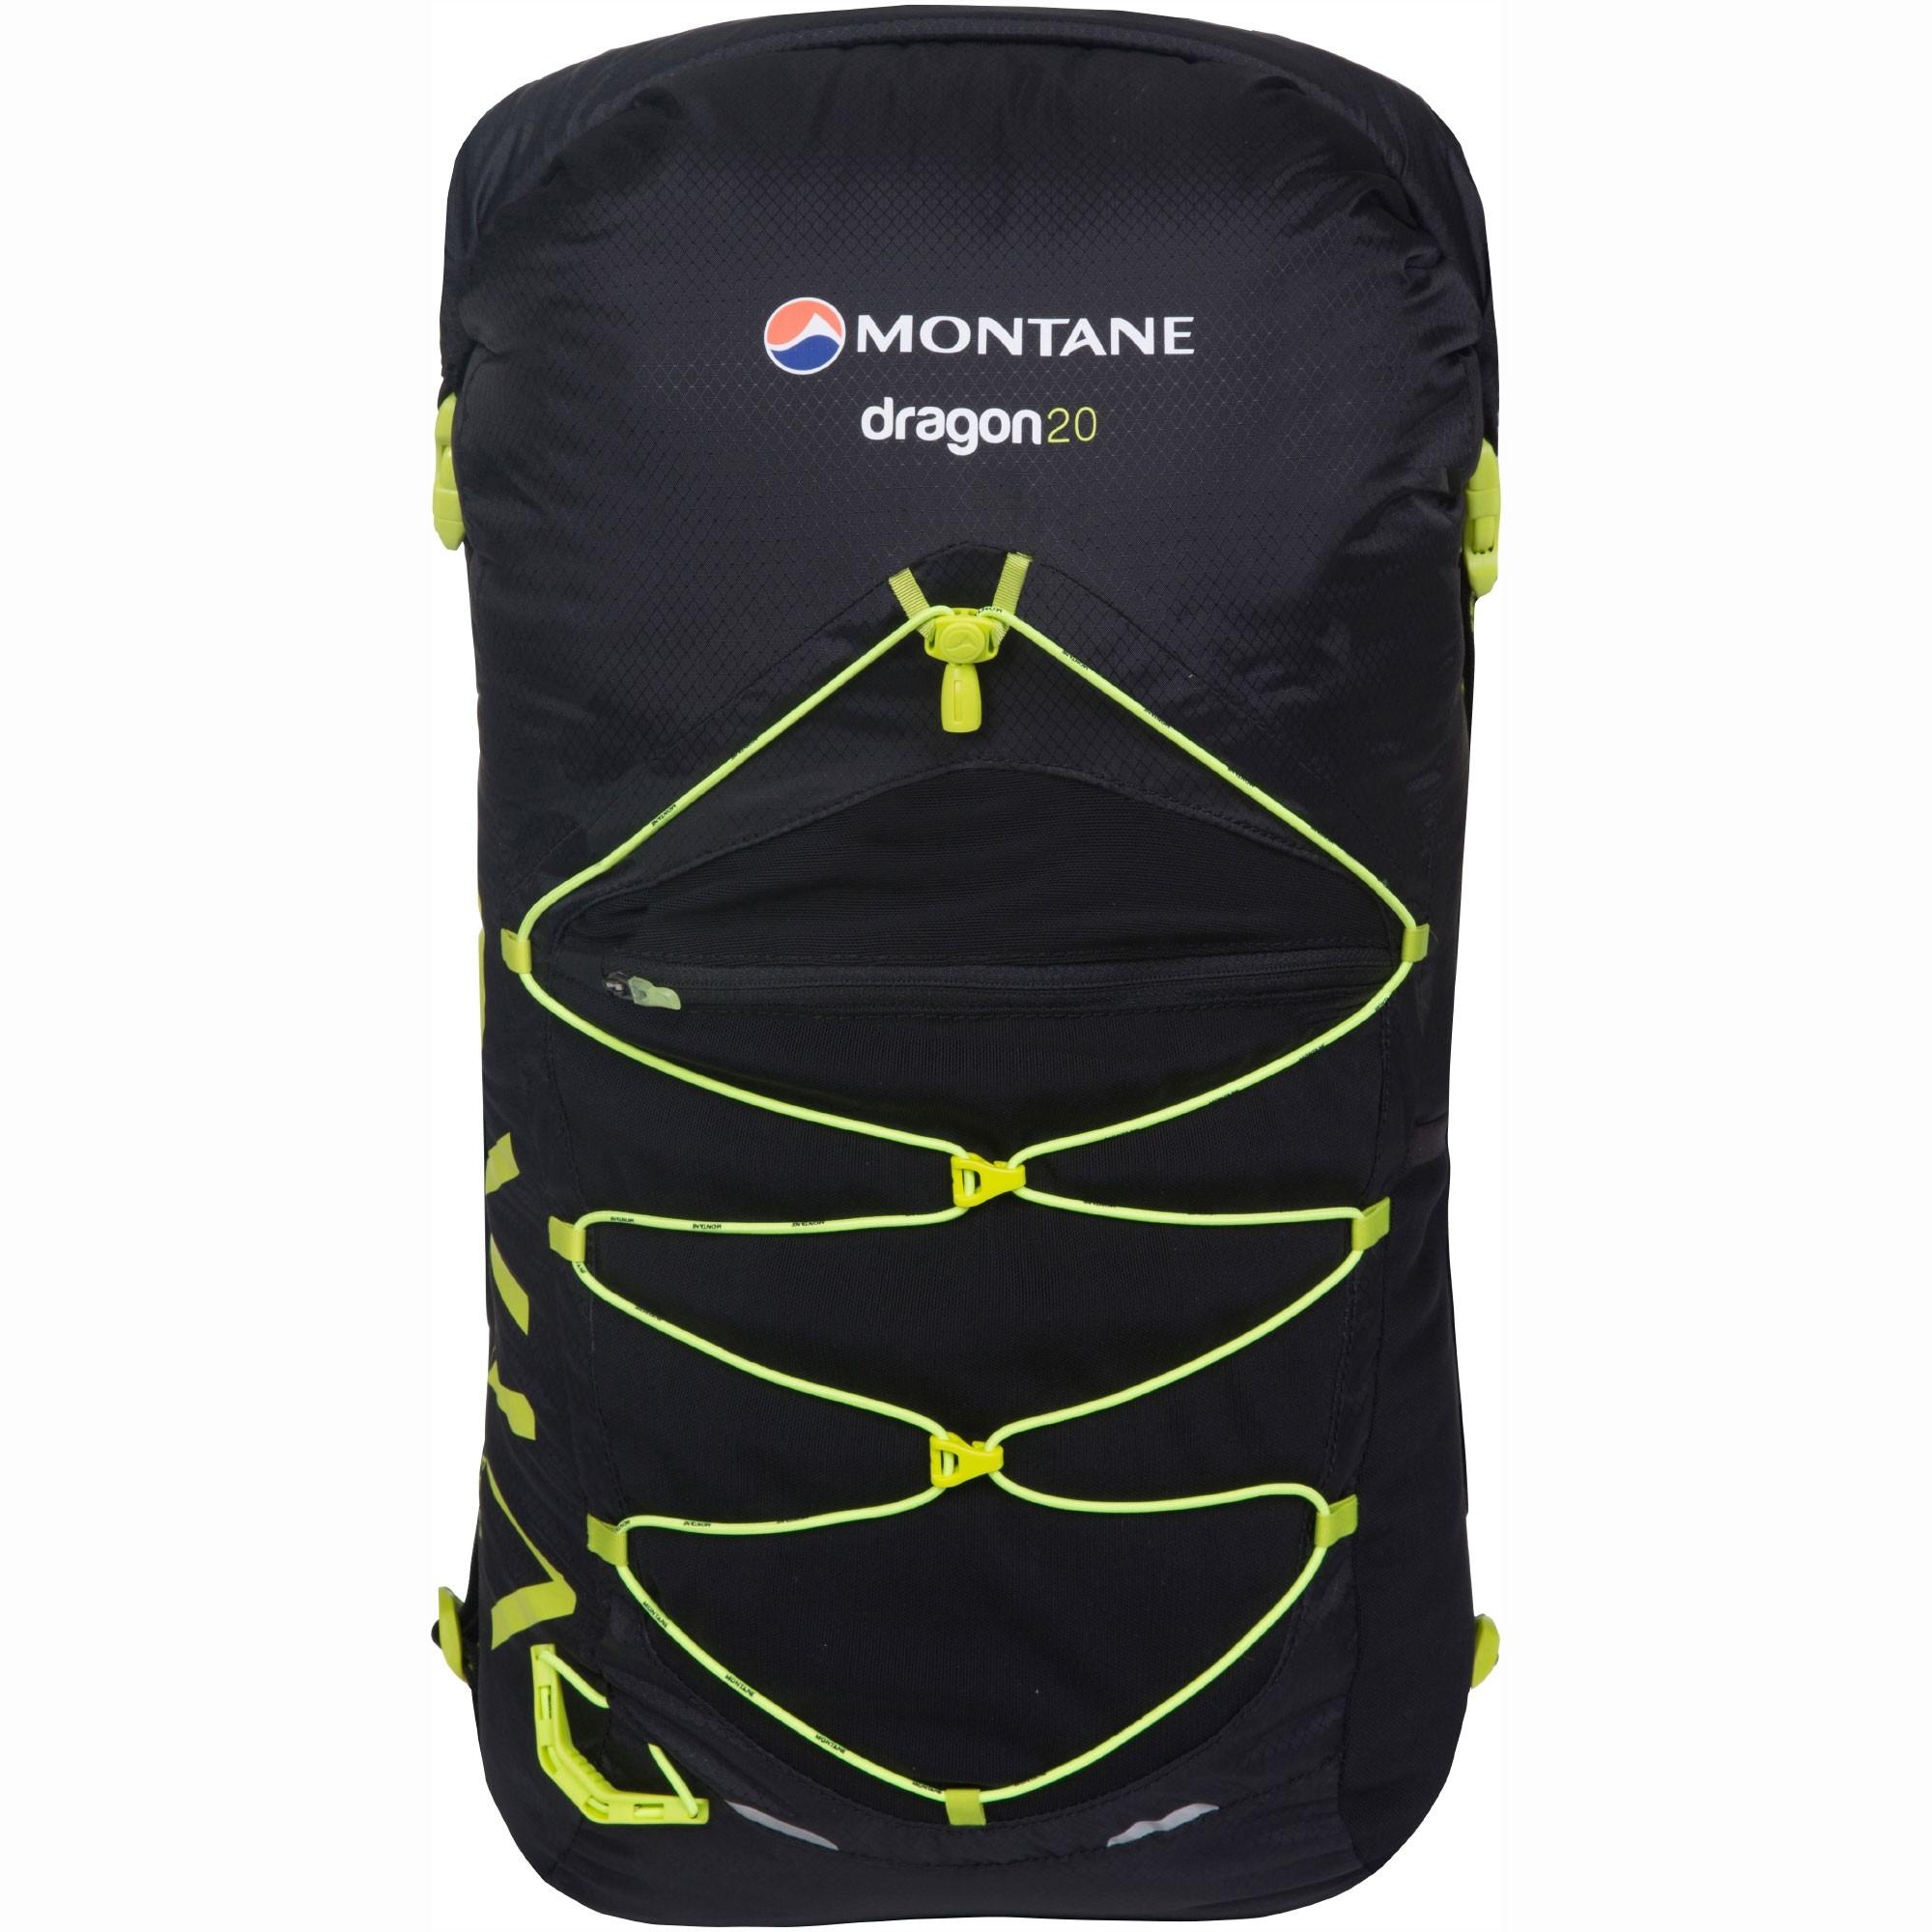 Montane Via Dragon 20 Trail Running Speedpack - Black/Laser Green